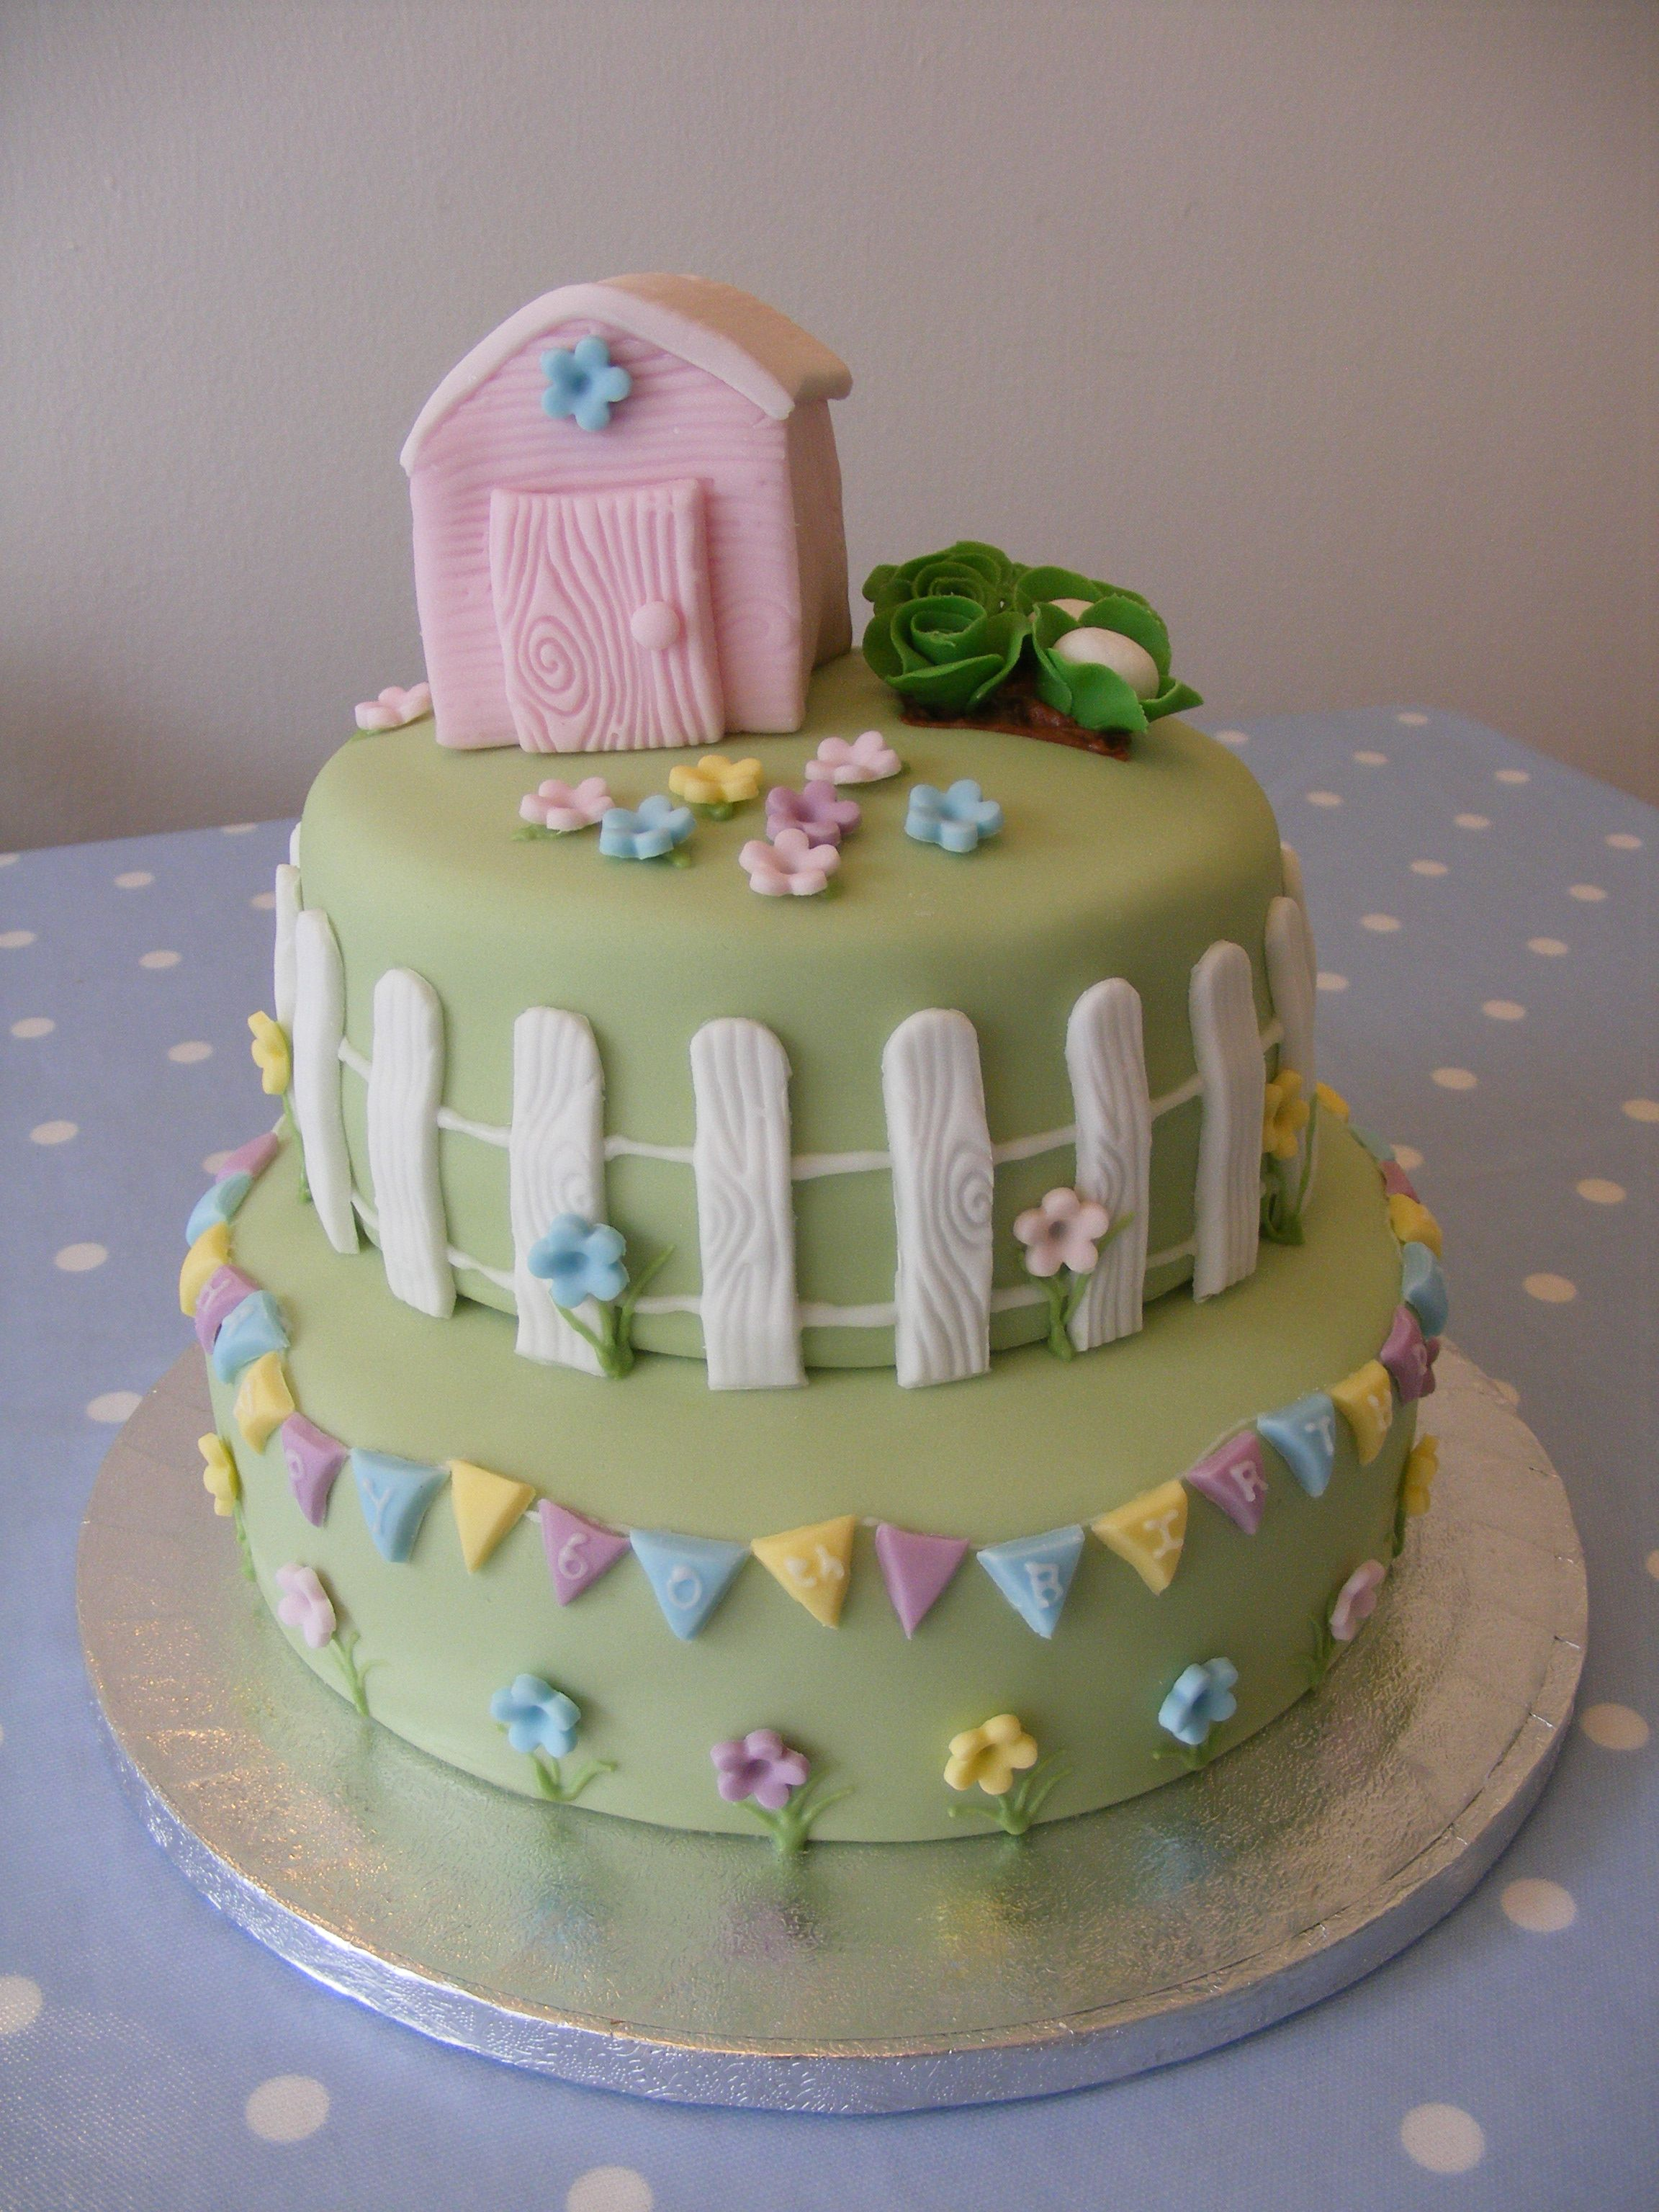 Tiered garden theme cake www.curiositeashop.co.uk/cakes | Cakes ...